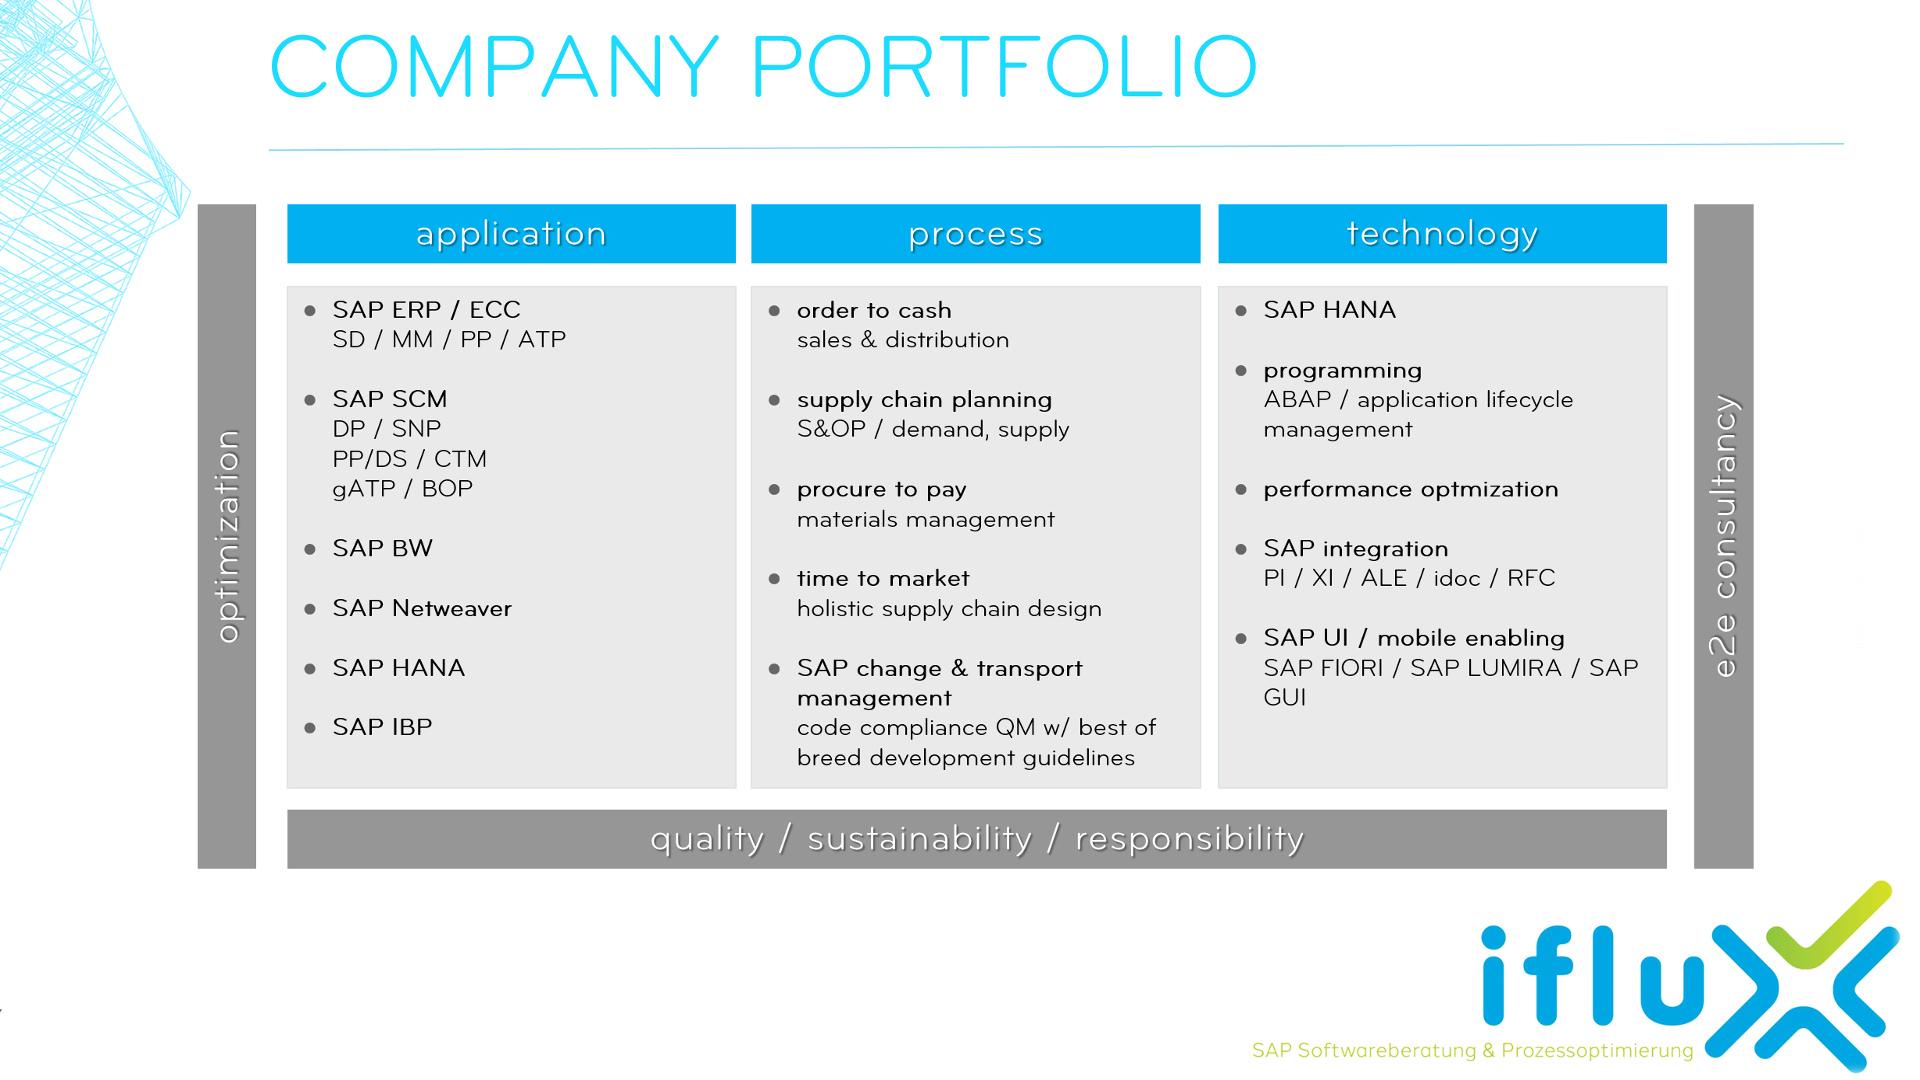 Company portfolio at a glance